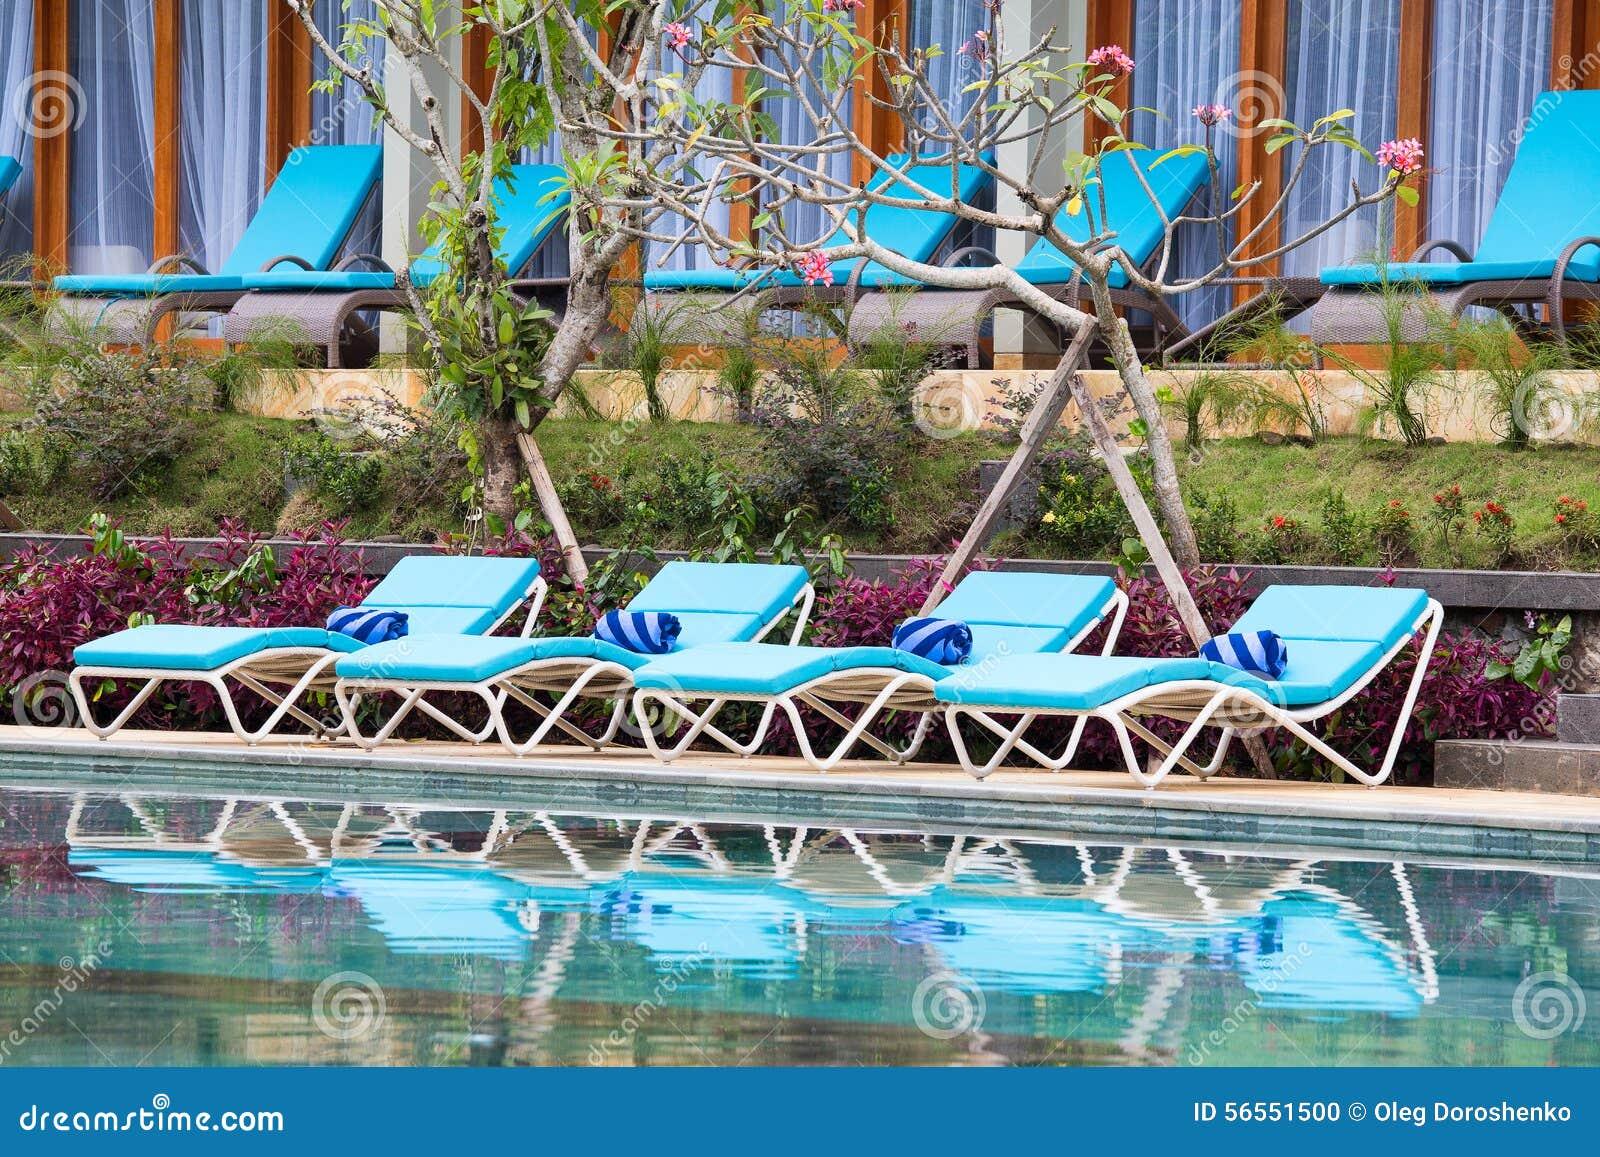 Download Καρέκλες παραλιών χαλάρωσης και πισίνα Στοκ Εικόνες - εικόνα από φυσικός, παράδεισος: 56551500